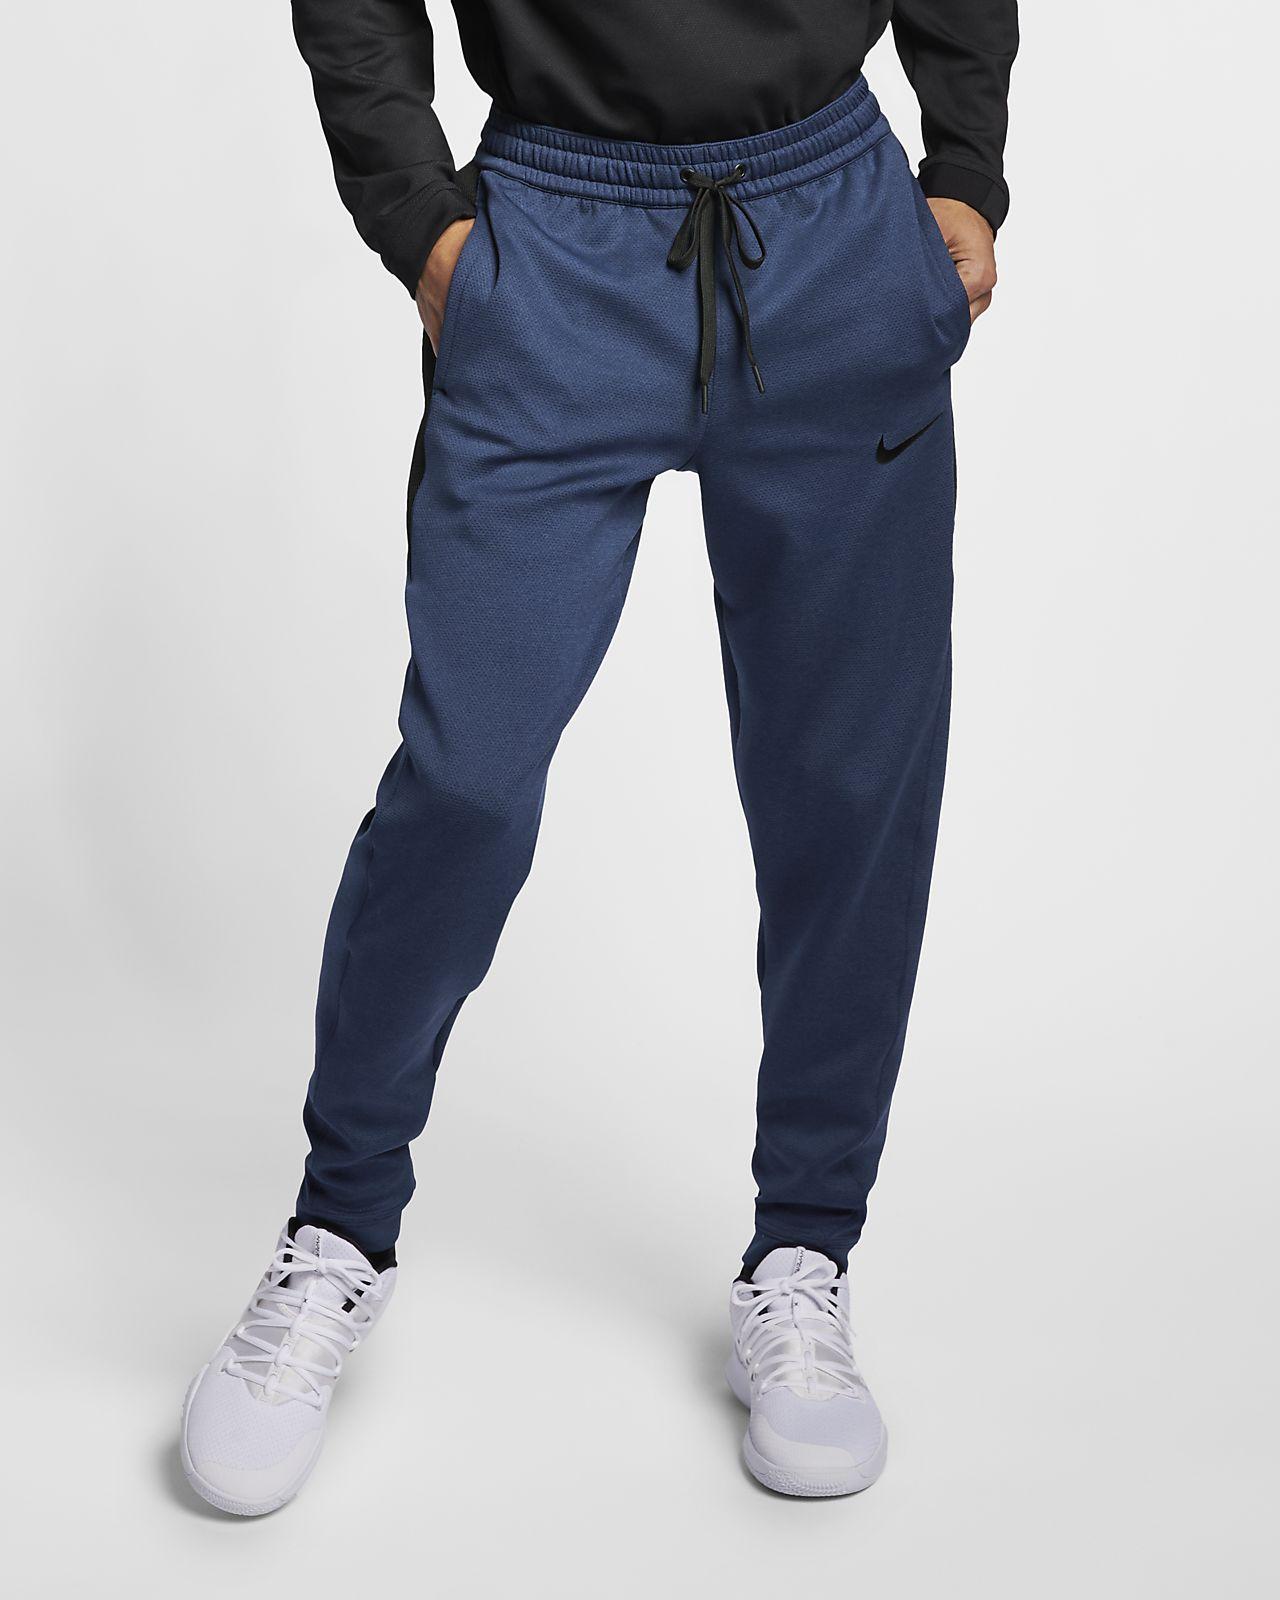 Nike Therma Flex Showtime Men's Basketball Pants